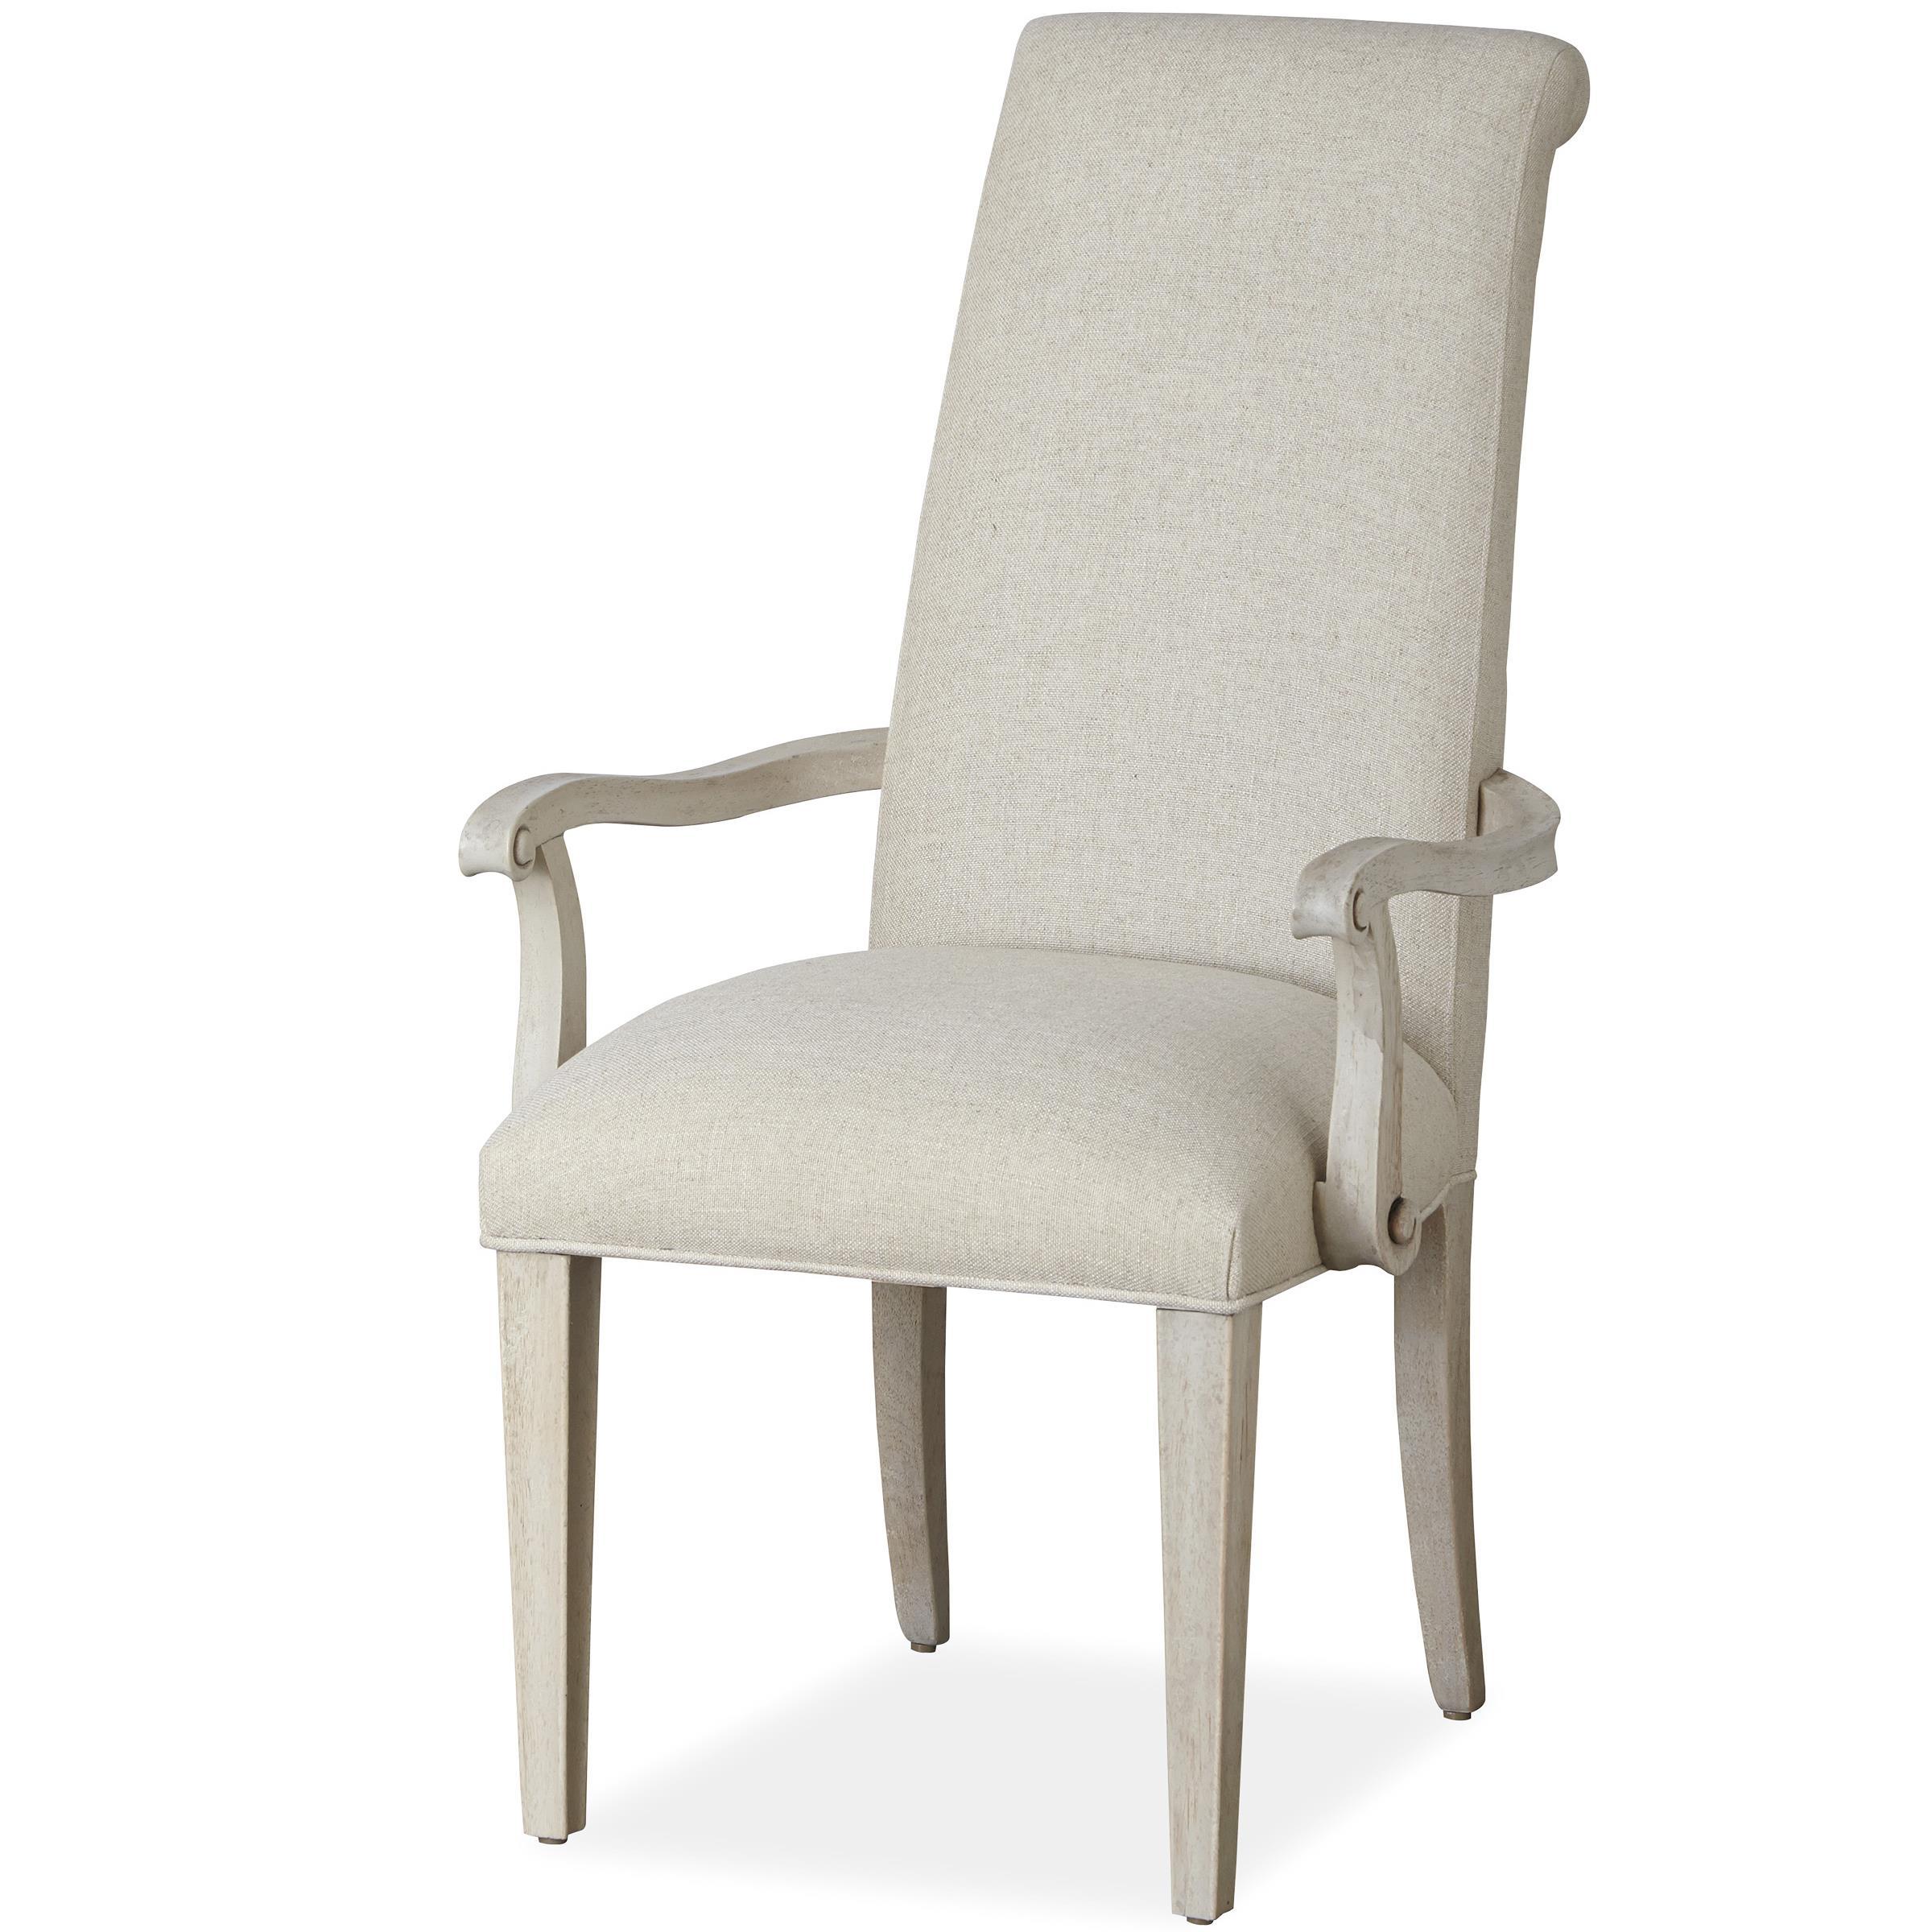 Universal California - Malibu Arm Chair - Item Number: 476639-RTA